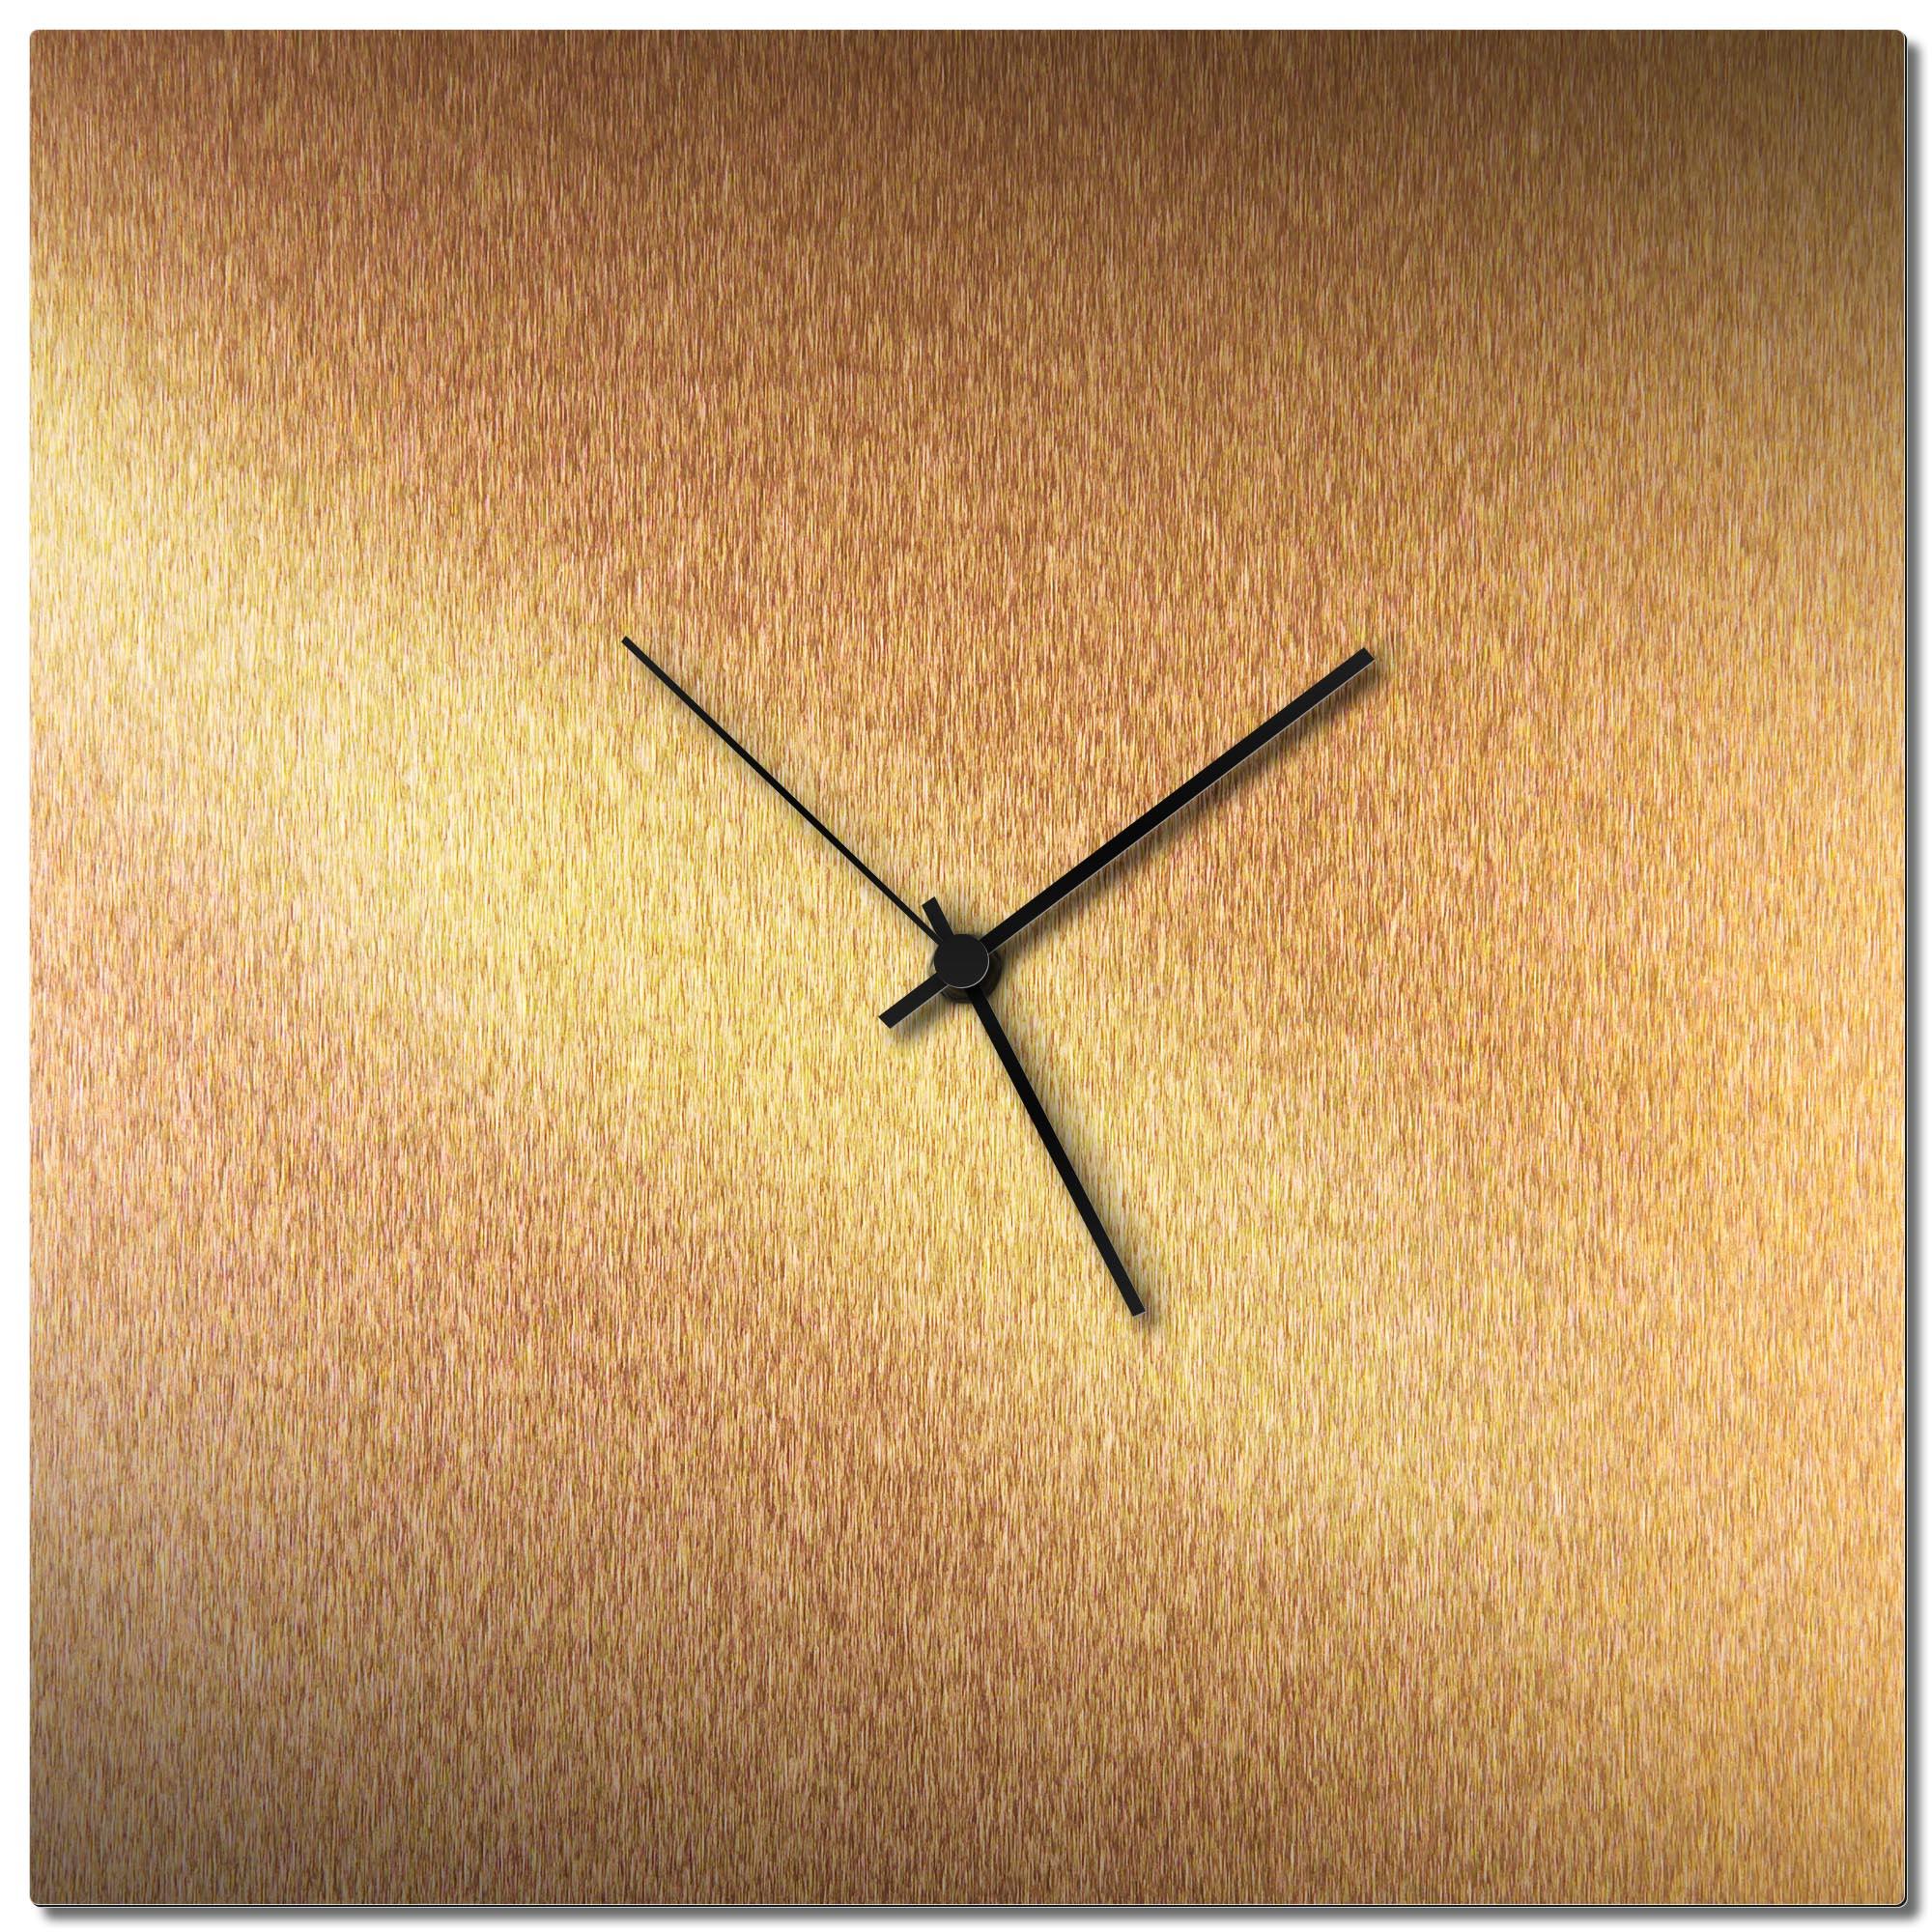 Adam Schwoeppe 'Bronzesmith Square Clock Large Black' Midcentury Modern Style Wall Clock